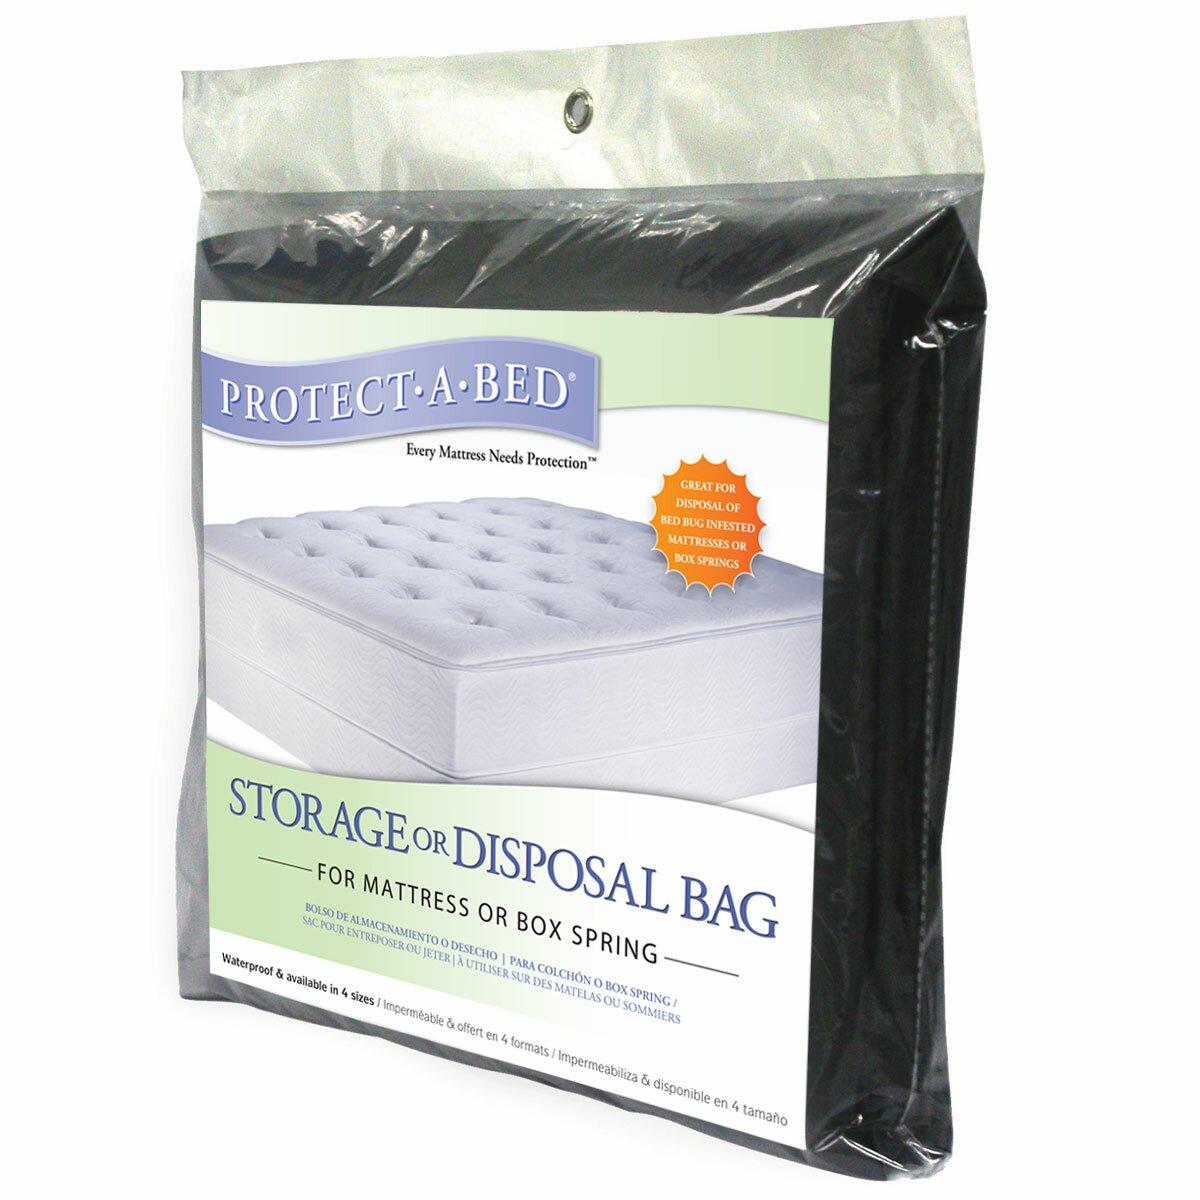 Protect A Bed Storage Disposal Waterproof Mattress